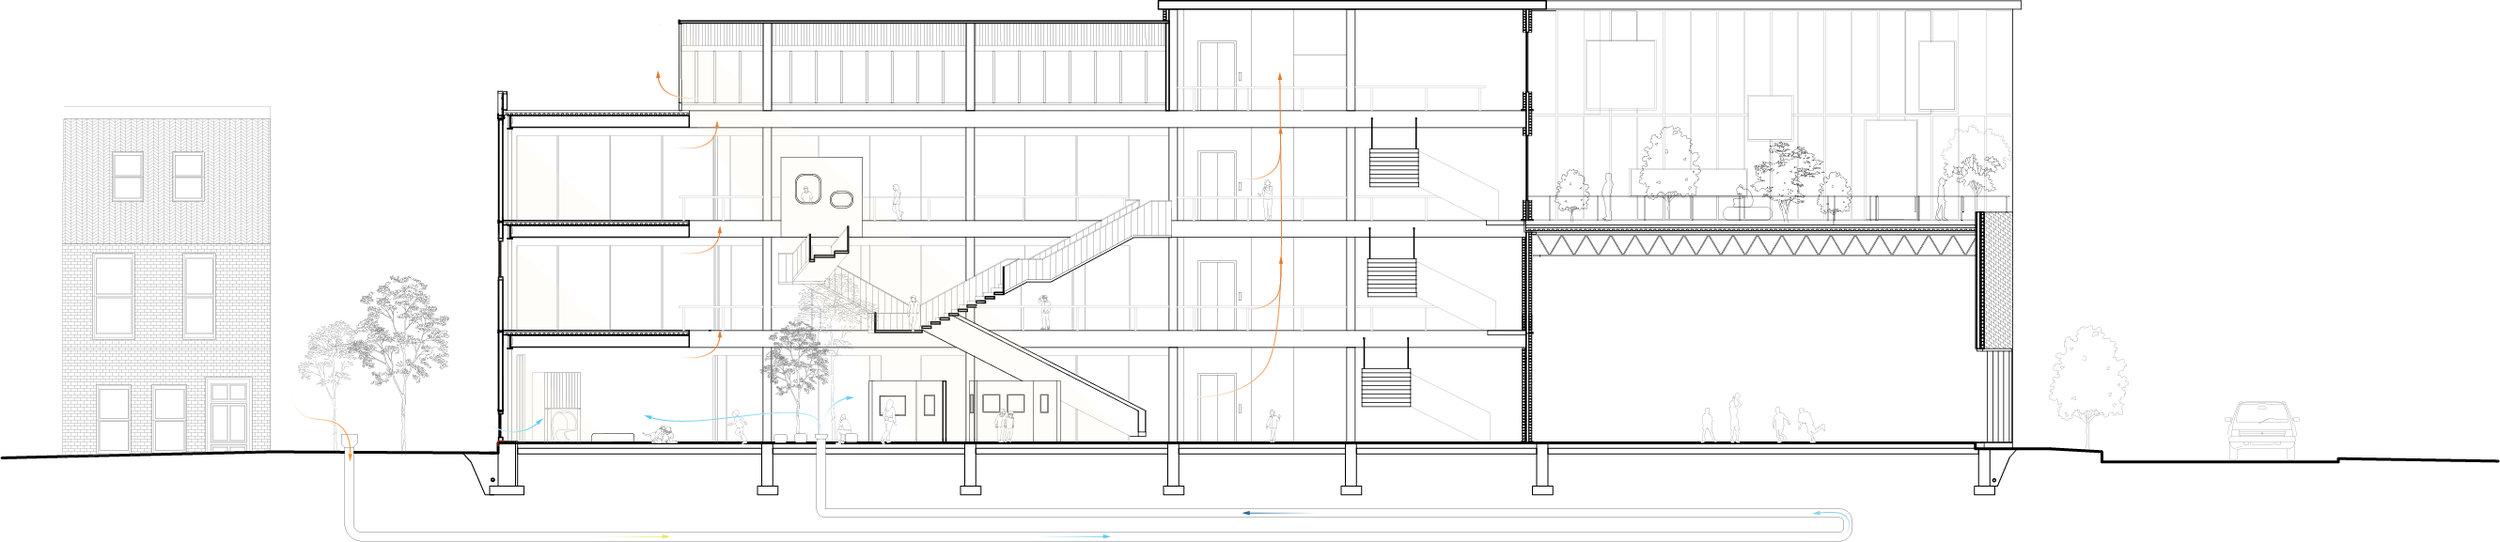 0428 1-8 section (3).jpg